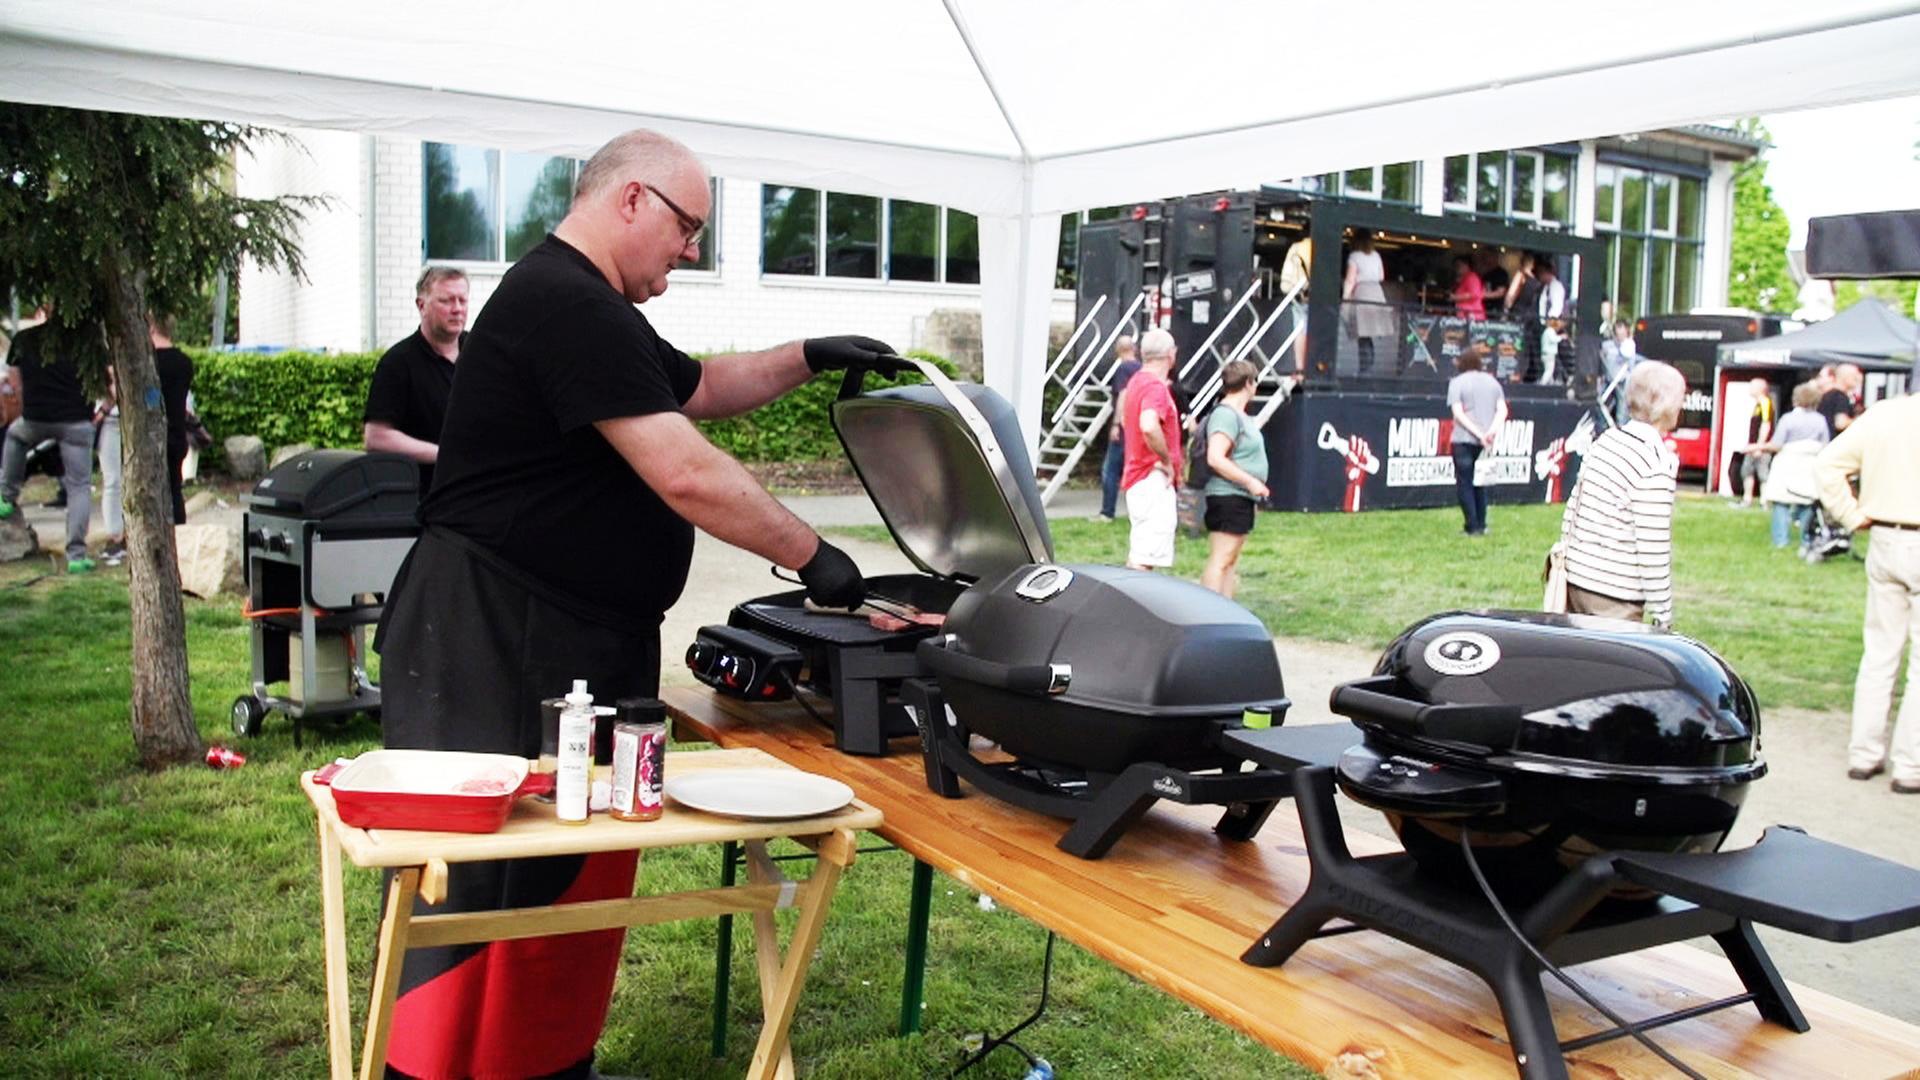 Weber Elektrogrill Hagebaumarkt : Teuer oder billig: grill briketts zdfmediathek